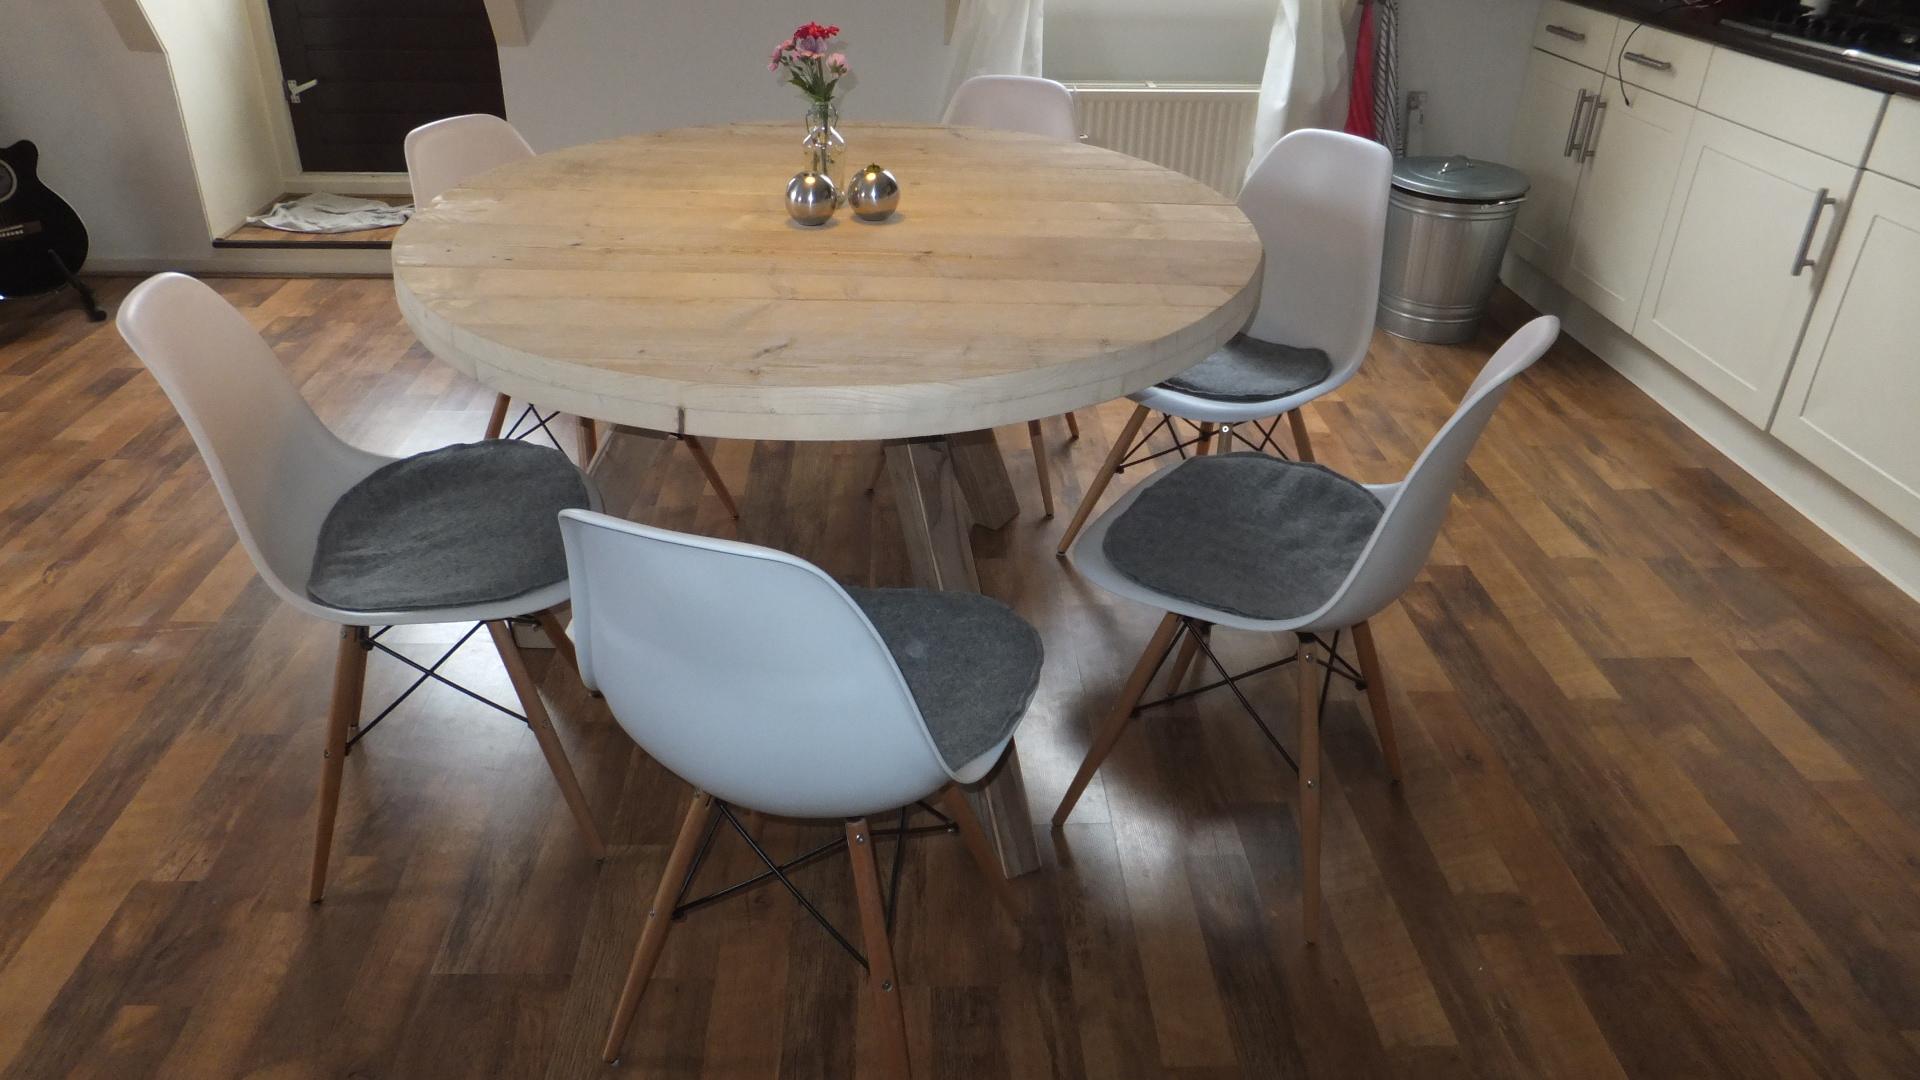 Steigerhouten ronde tafel jl meubelmaatwerk for Steigerhouten eettafel bank